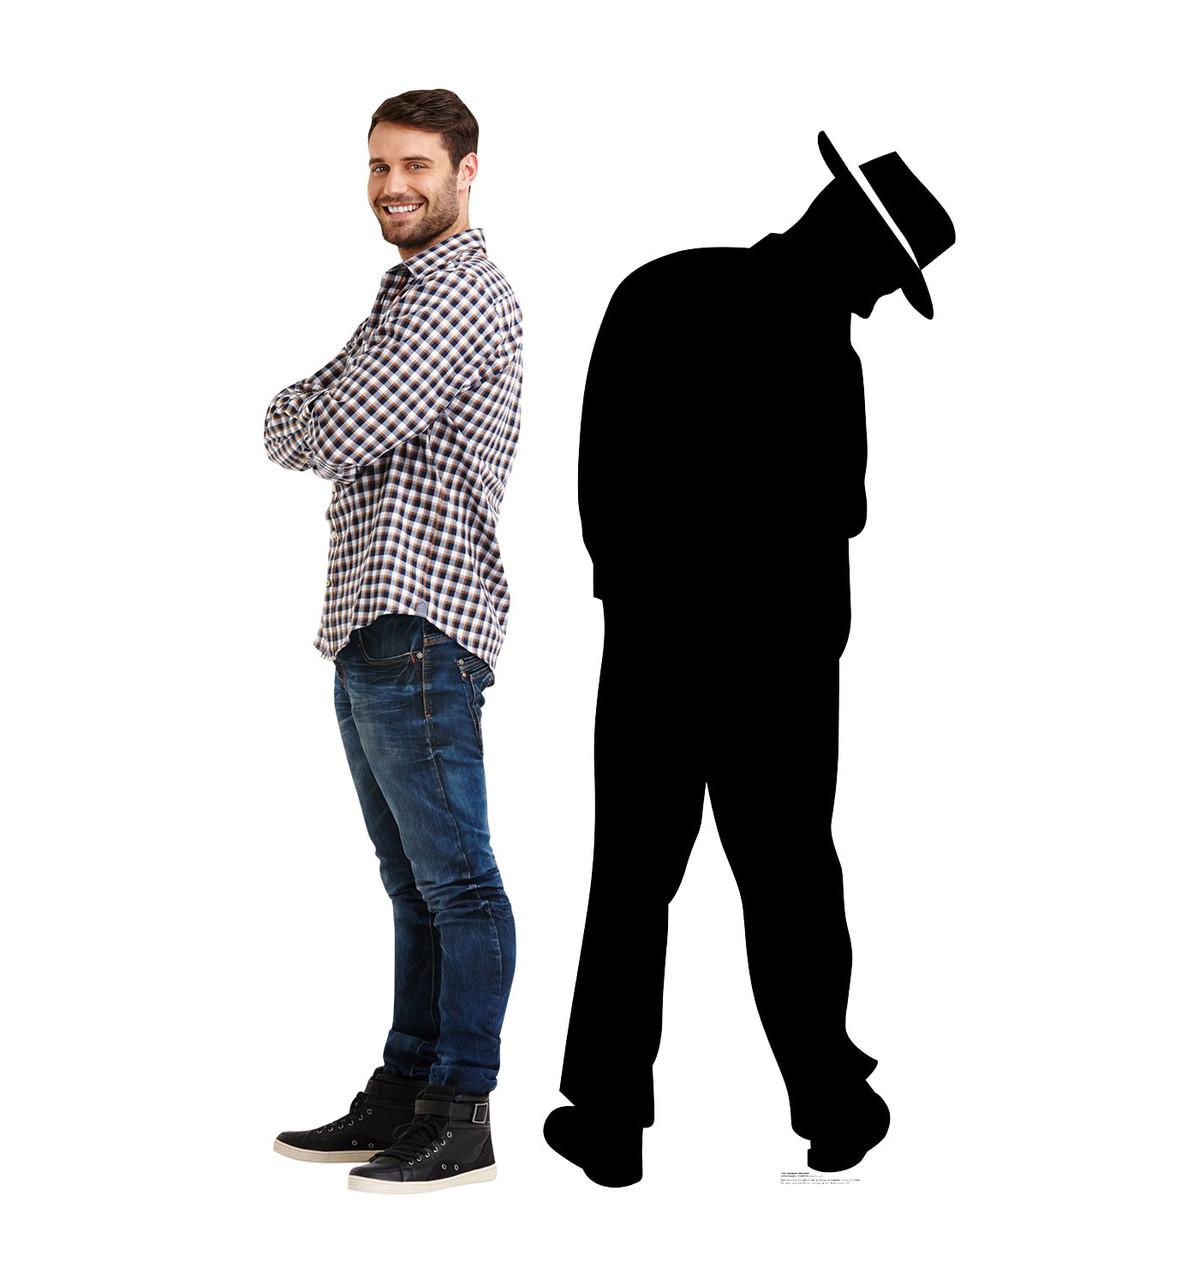 Life-size Gangster Silhouette Cardboard Standup | Cardboard Cutout 2